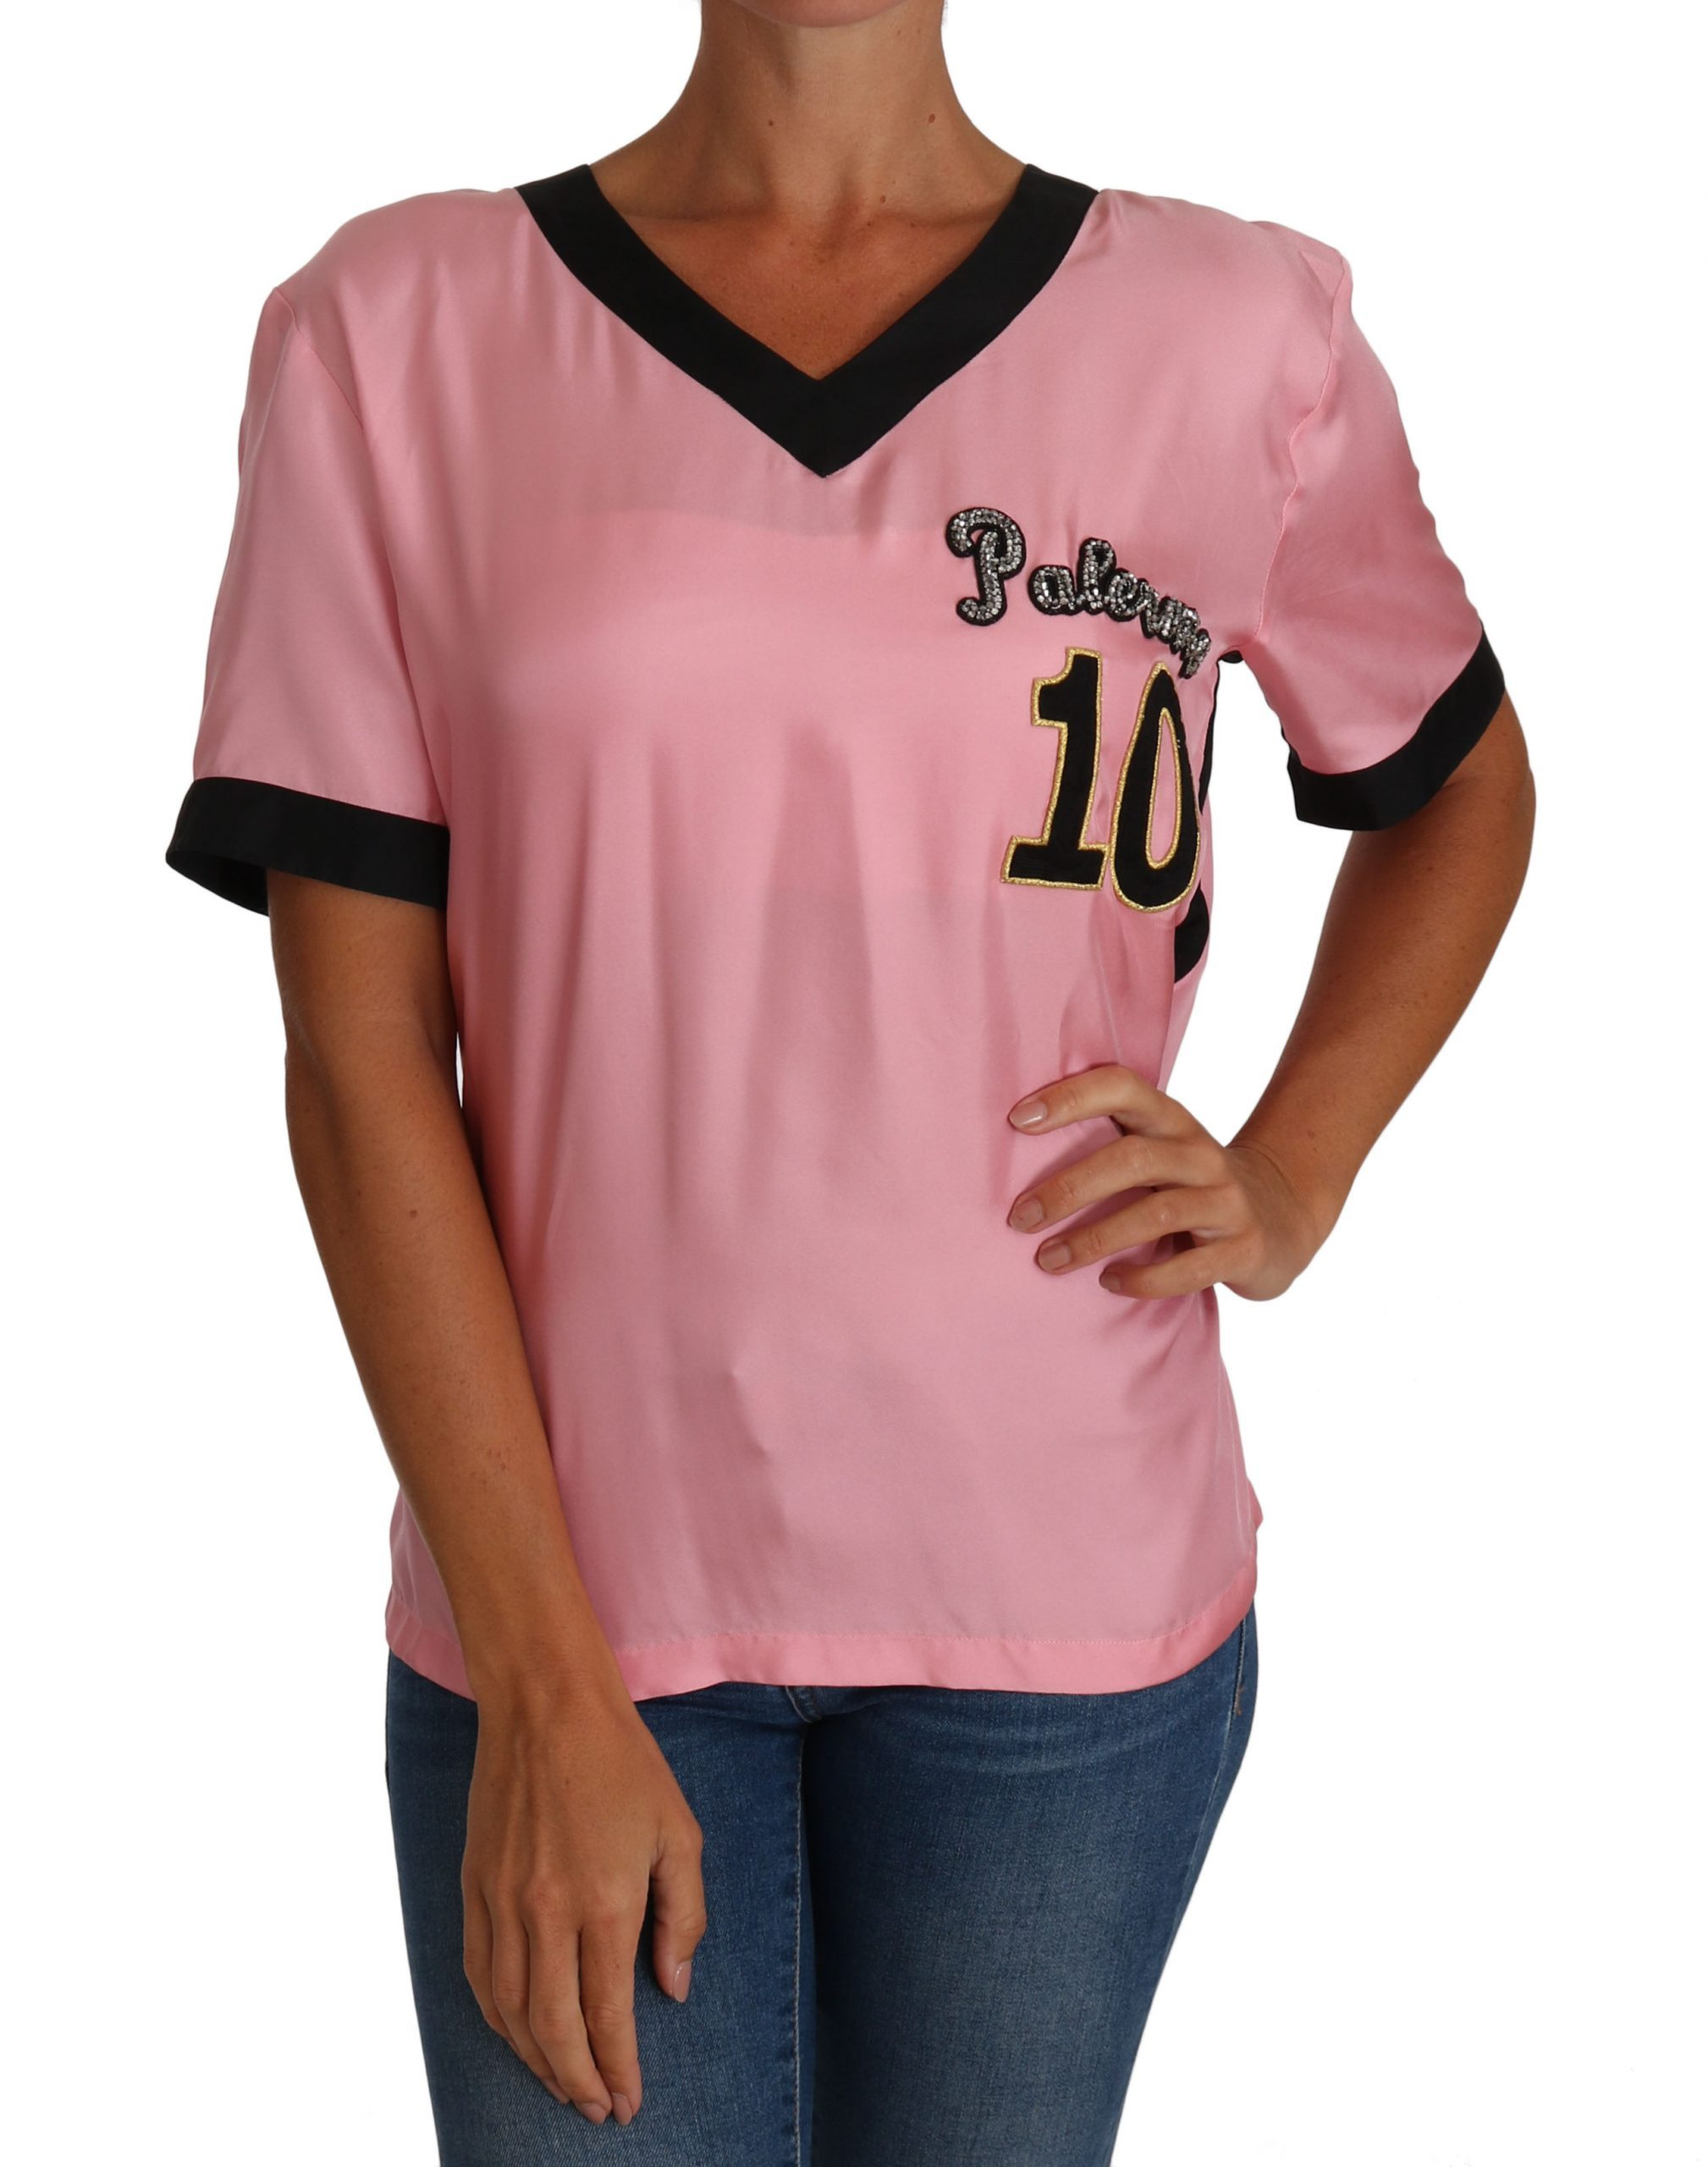 Dolce & Gabbana Women's Silk Crystal V-Neck T-Shirts Pink TSH2435 - IT44|L